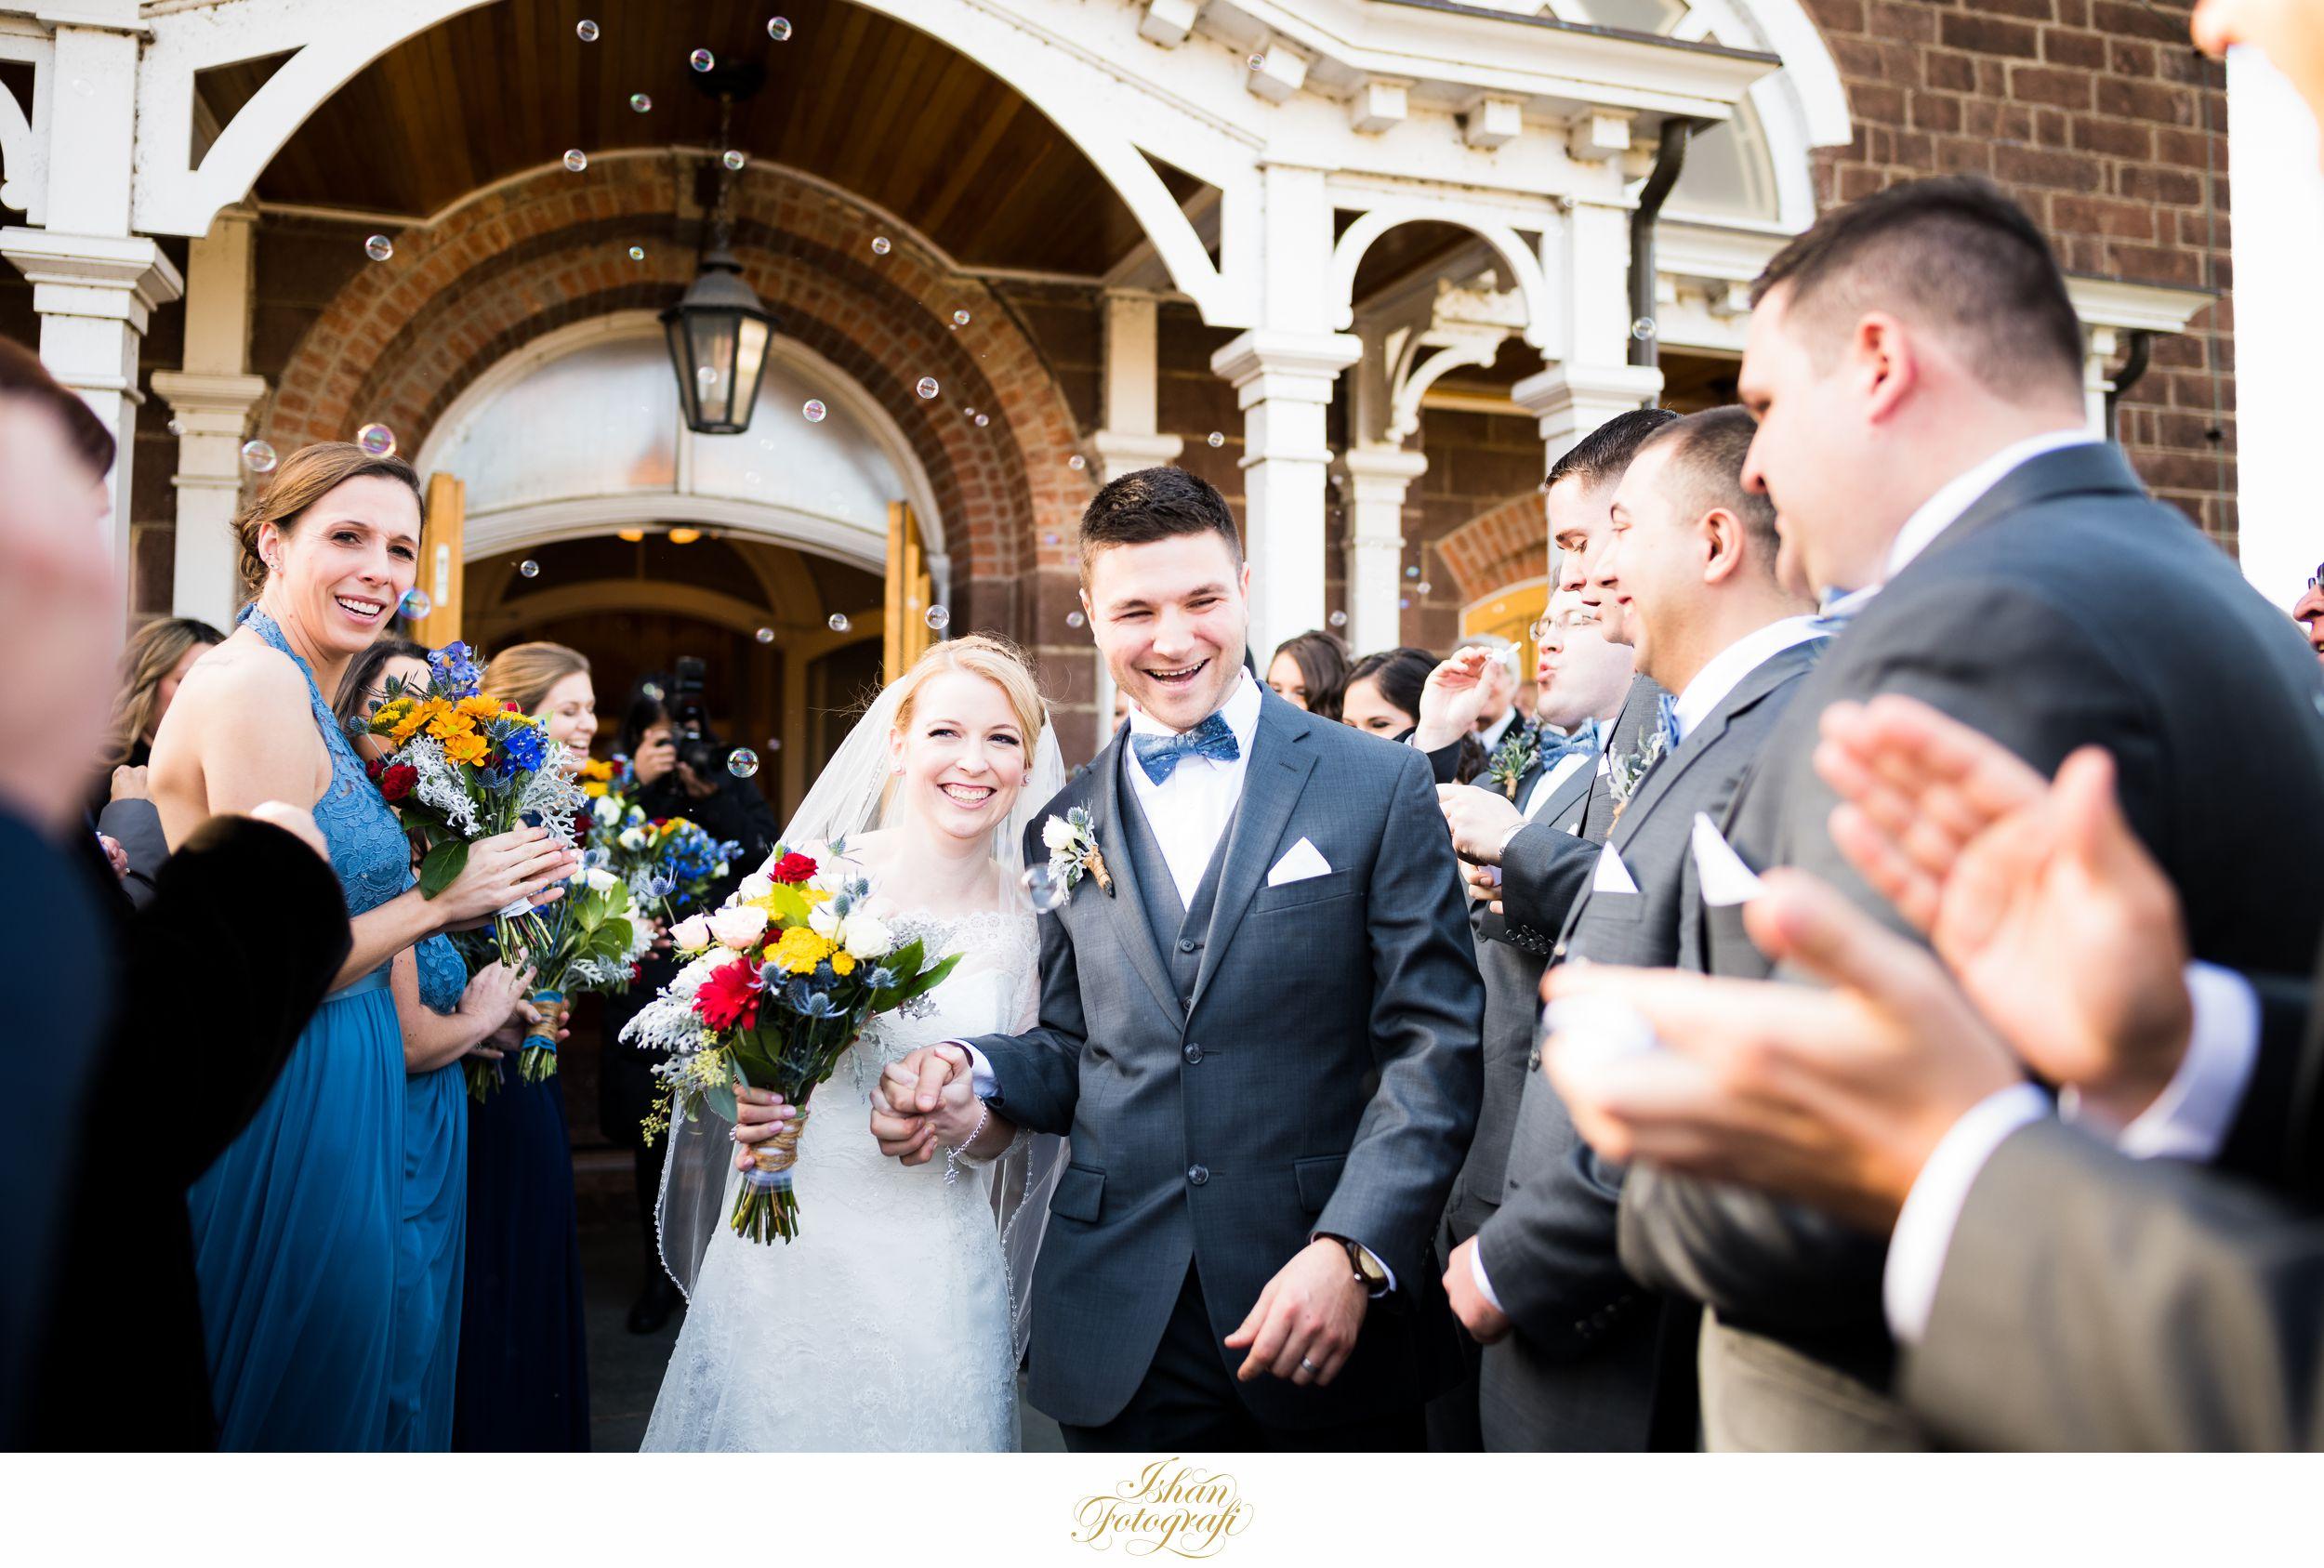 old-paramus-reformed-church-wedding-photo